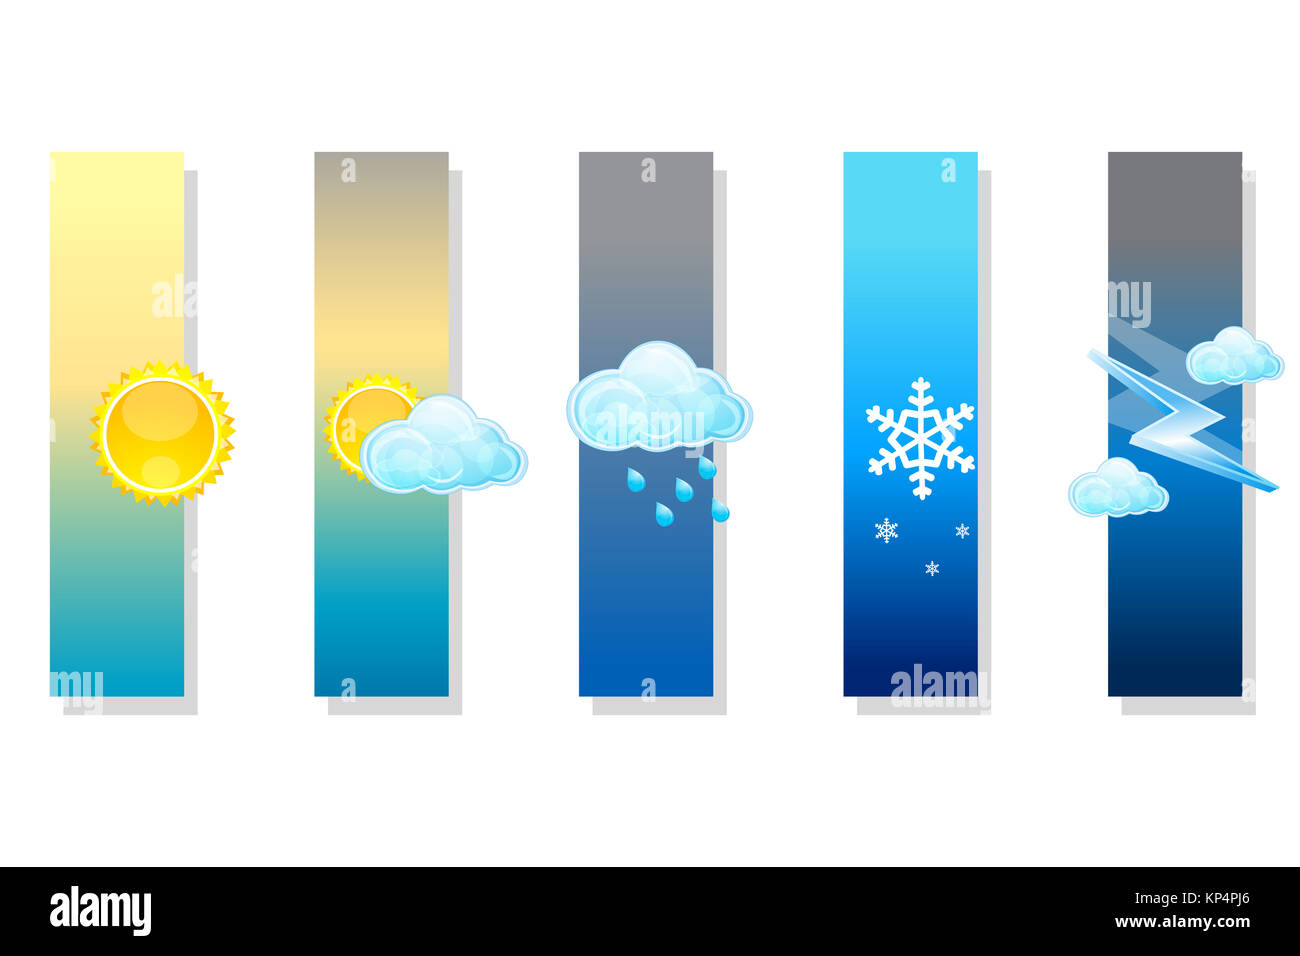 illustration of types of weather on white background - Stock Image